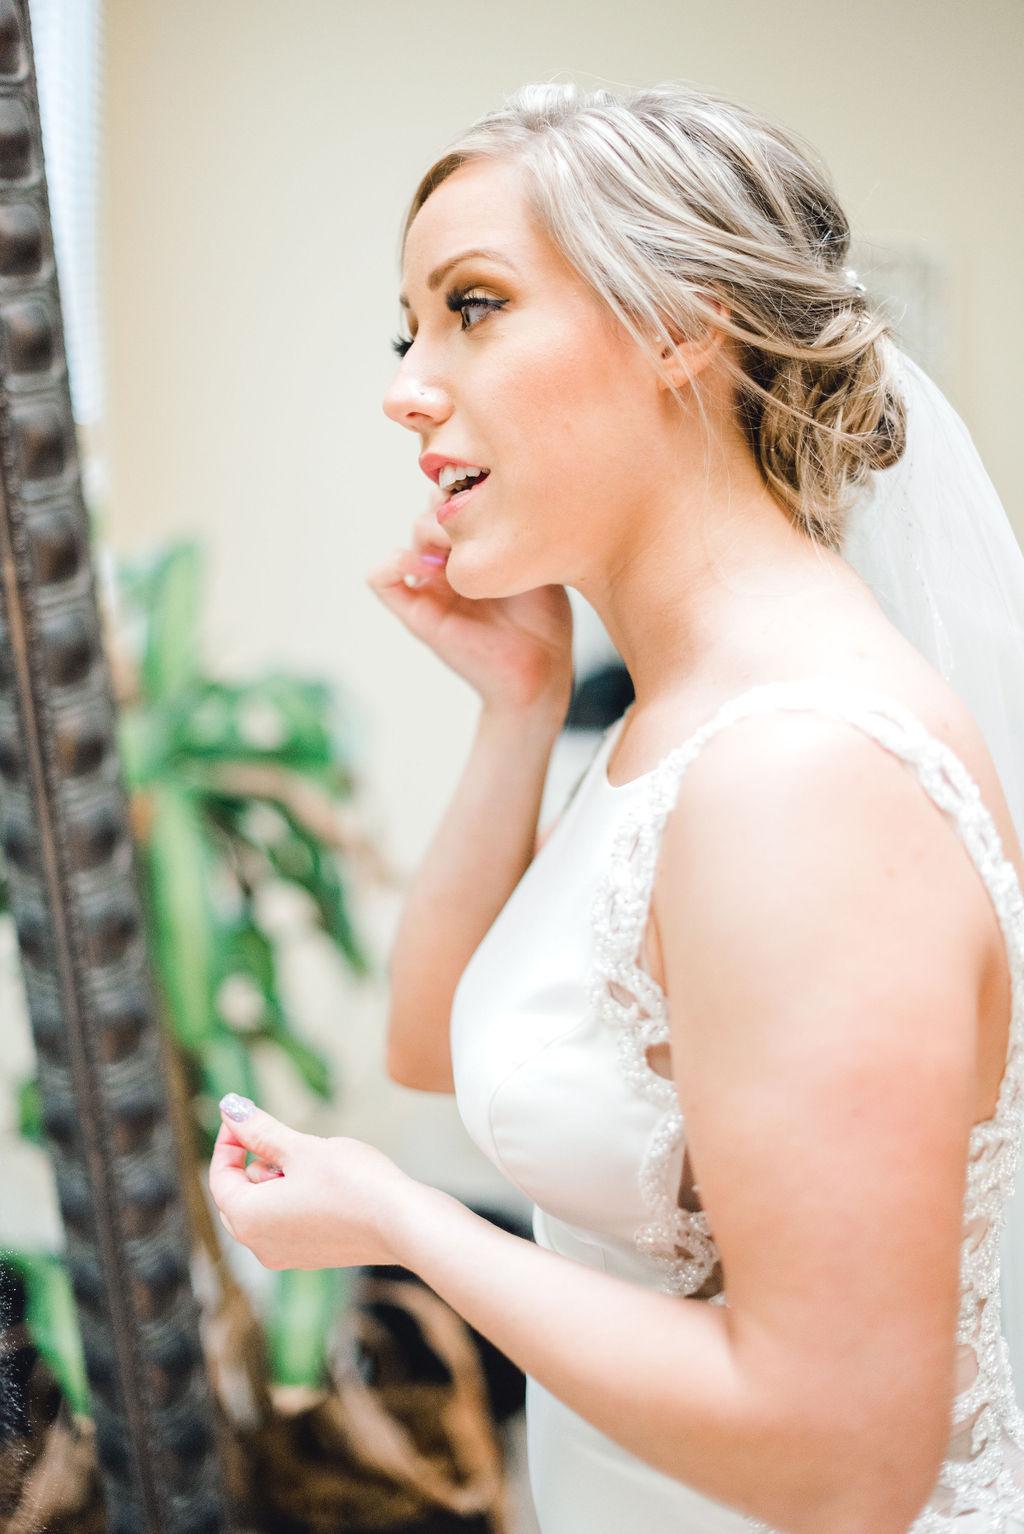 Dayton-event-planner-wedding-getting-ready-bride-cincinnati-ohio.jpg